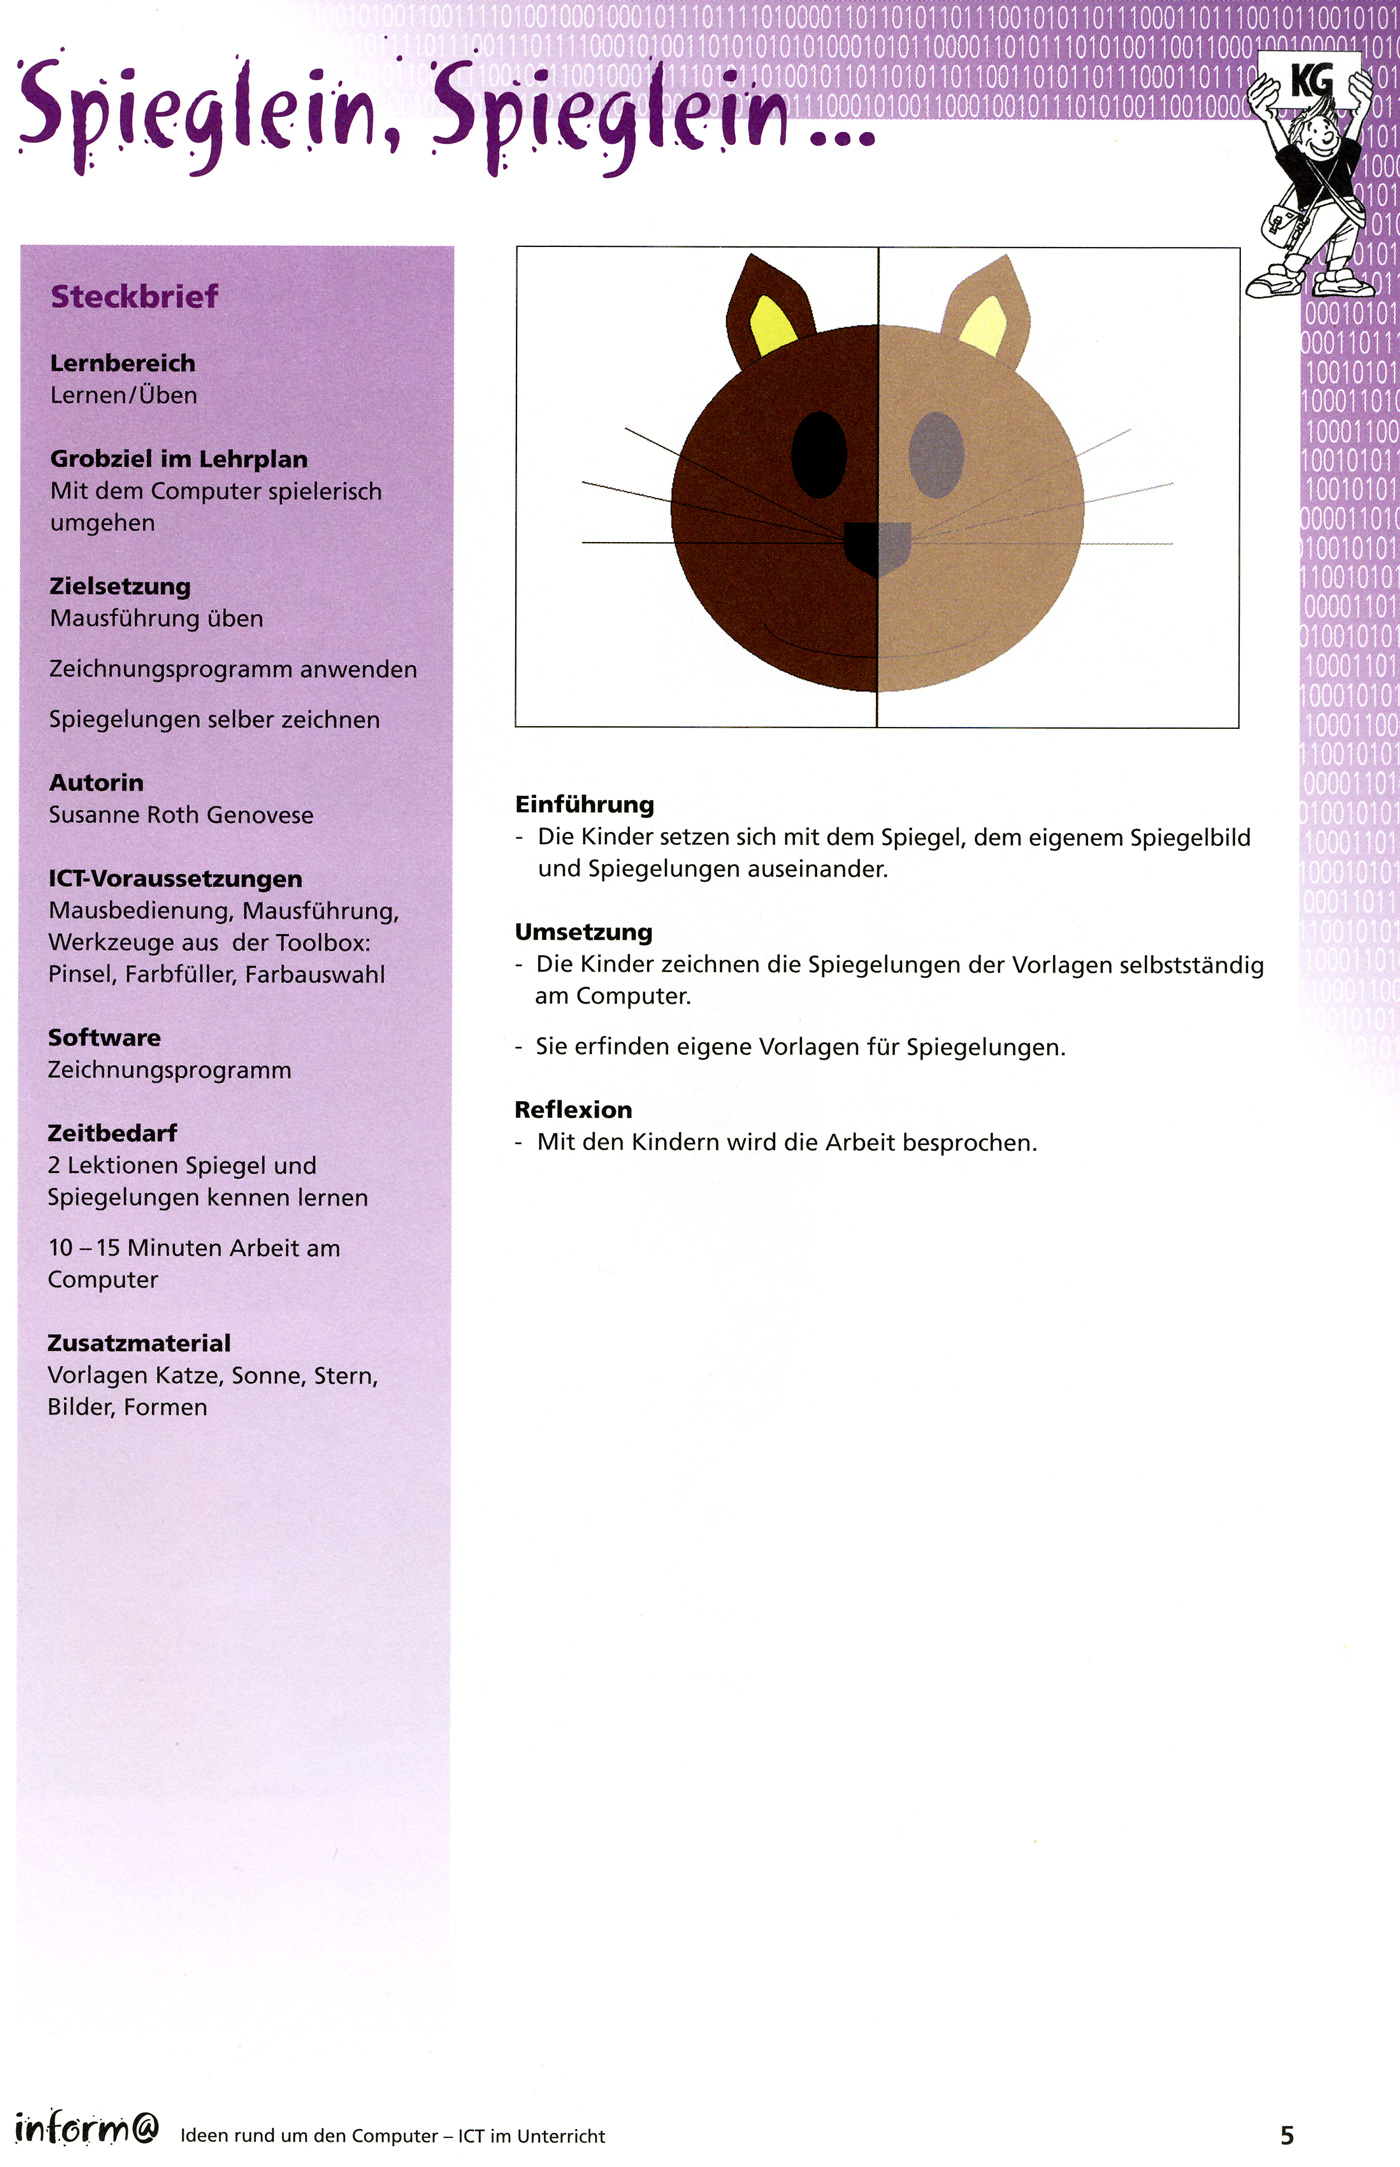 Großzügig Lehrplan Vorlage College Galerie - Entry Level Resume ...